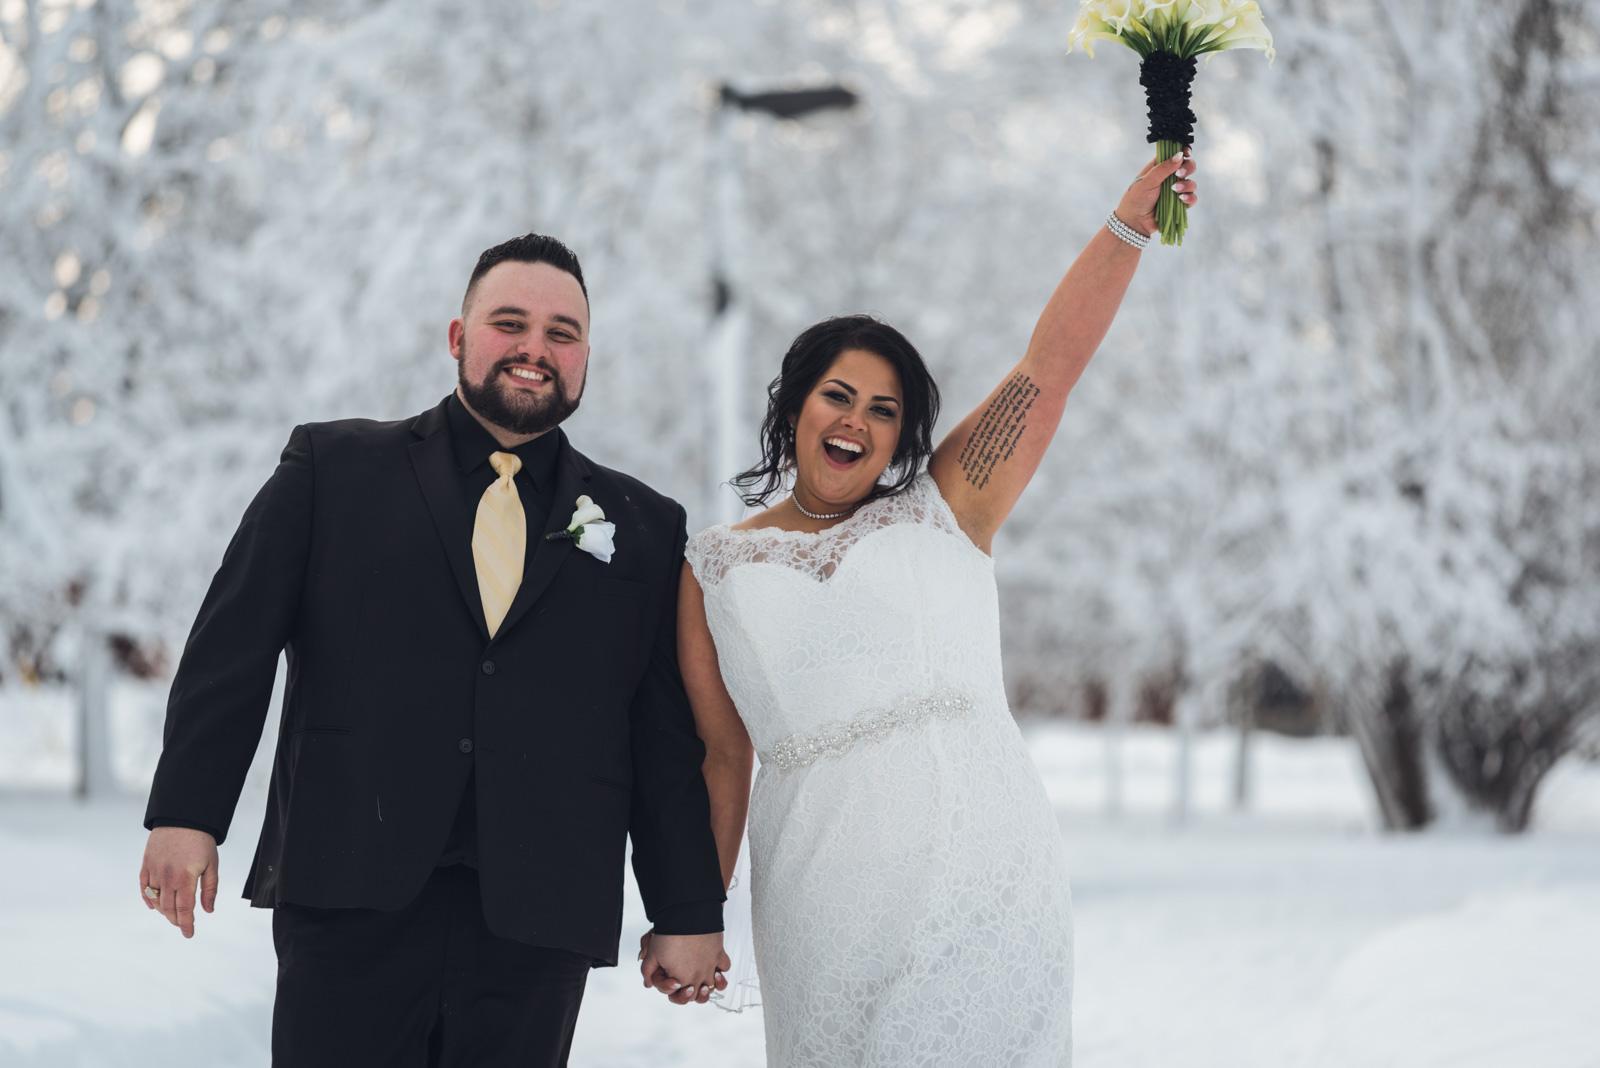 rheana-chris-wedding-blog-174.jpg